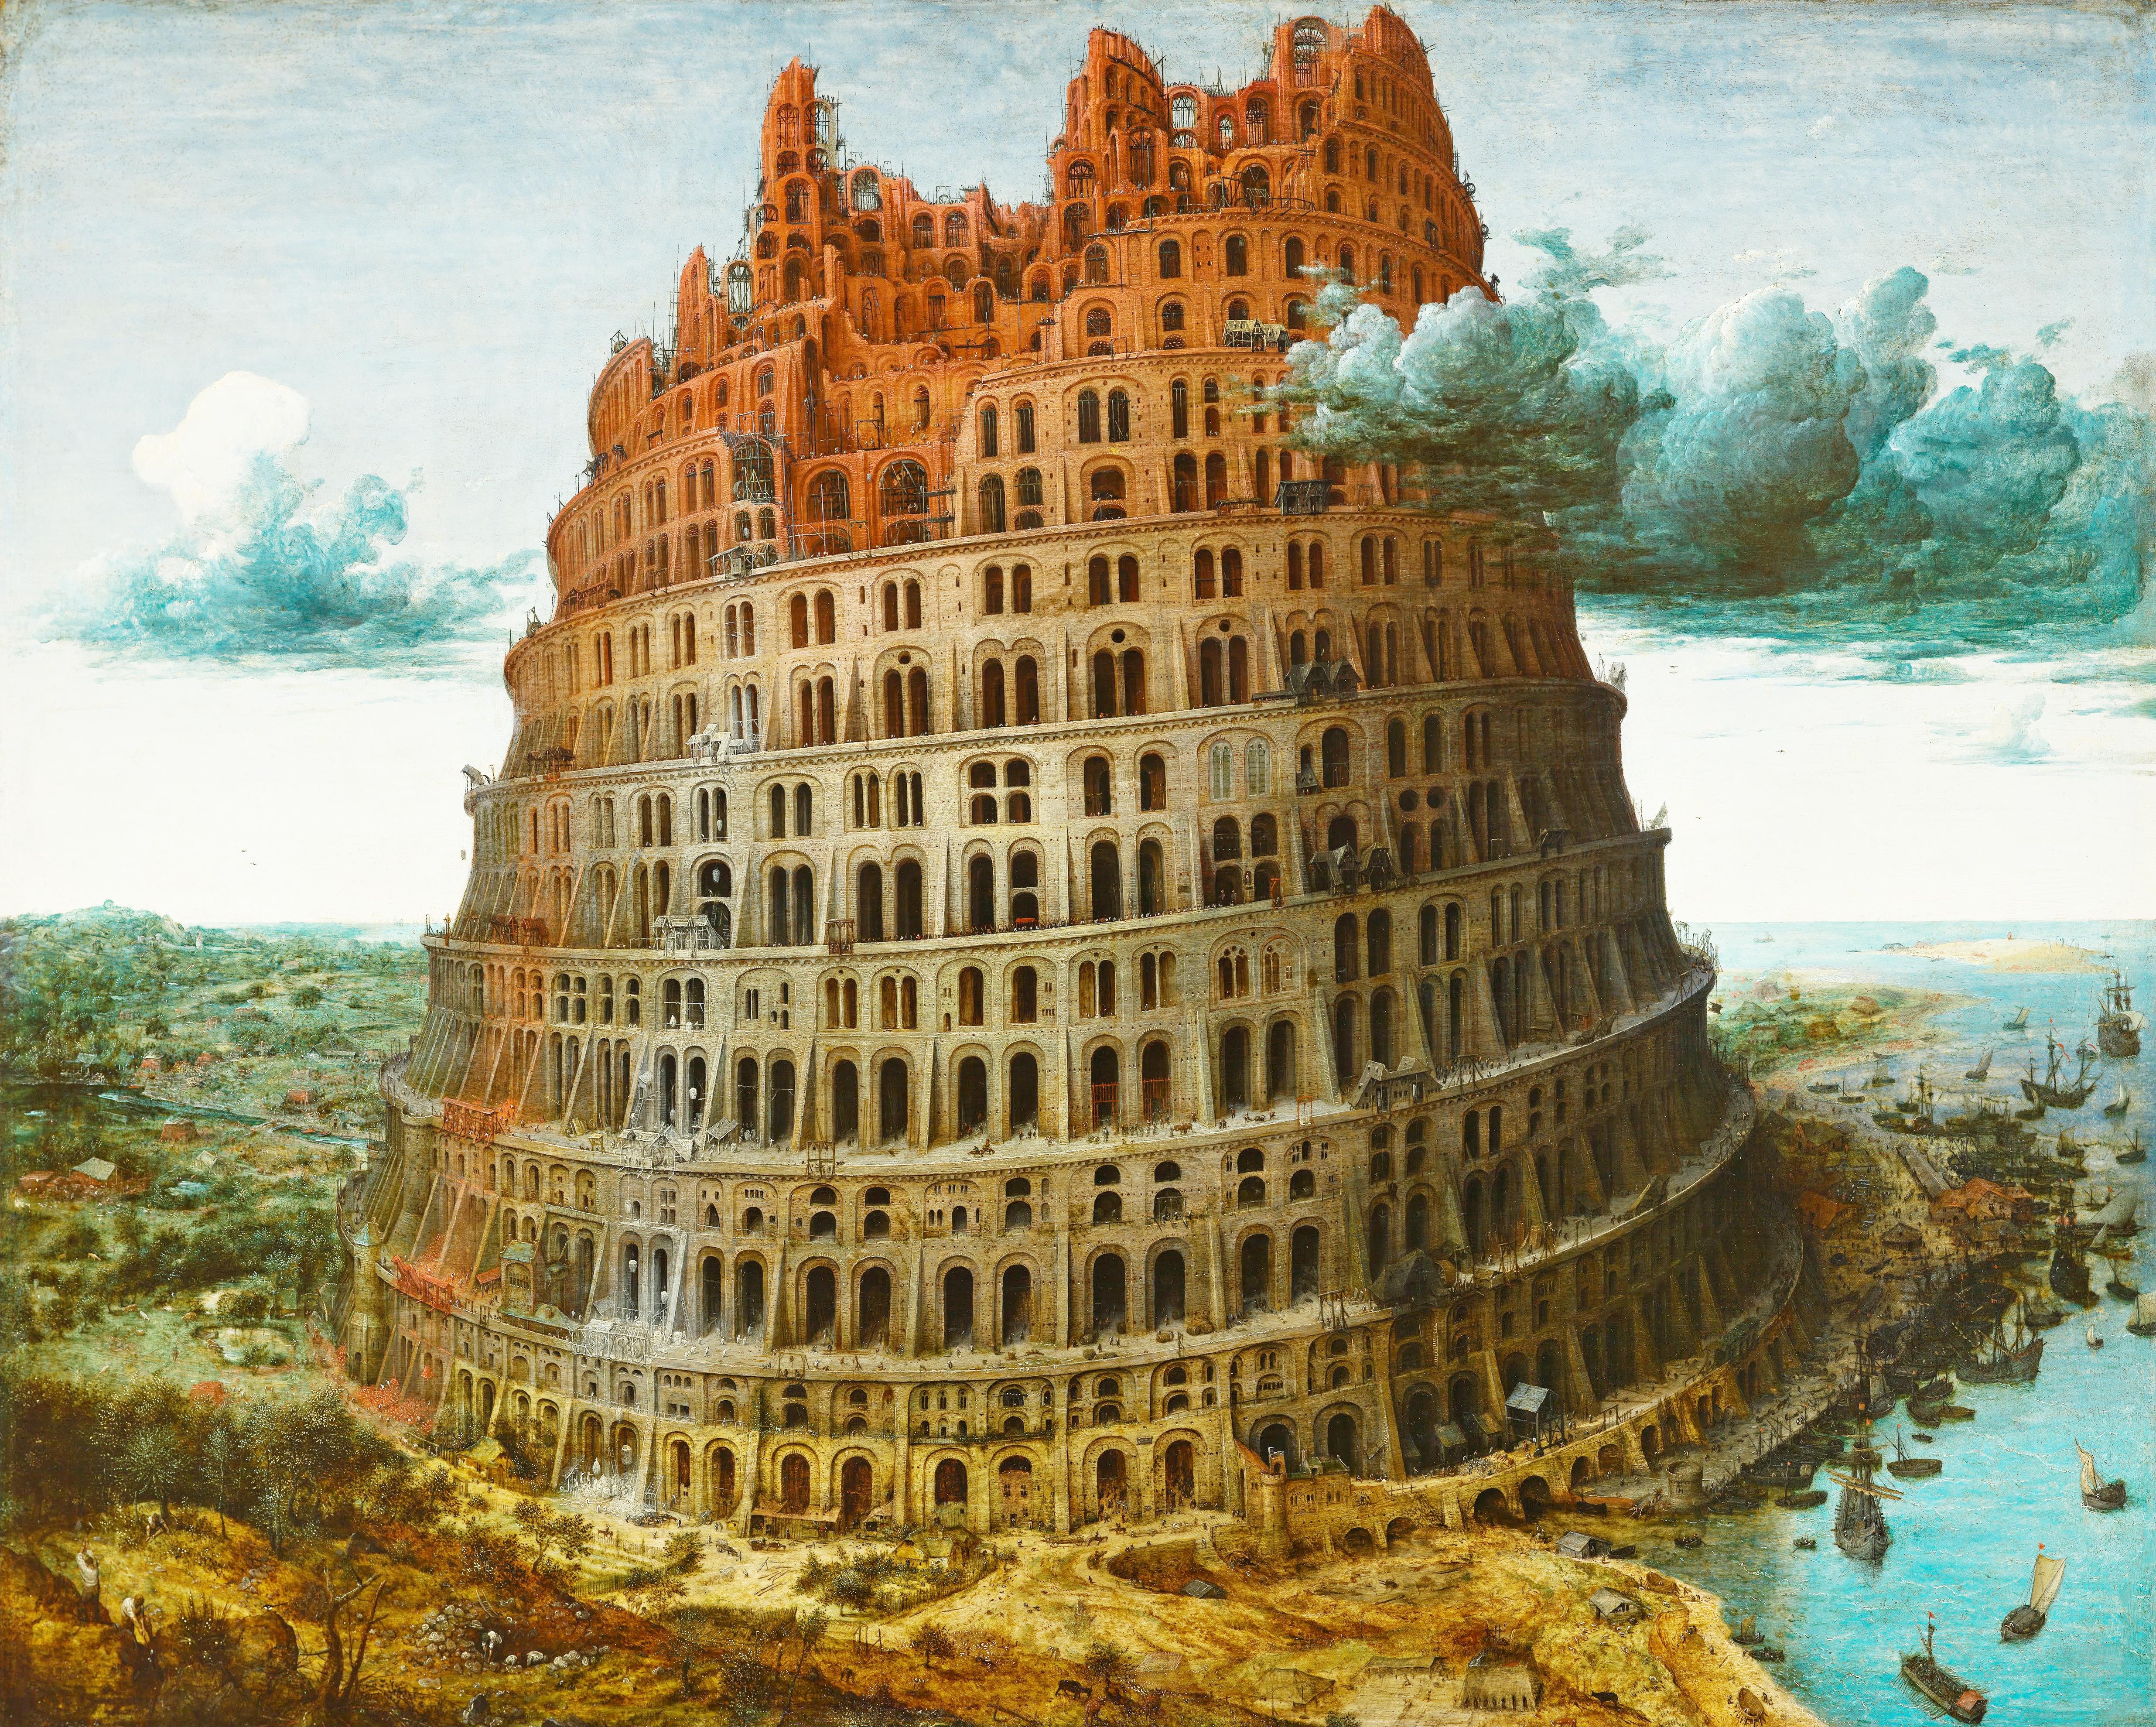 https://en.wikipedia.org/wiki/The_Tower_of_Babel_(Bruegel)#/media/File:Pieter_Bruegel_the_Elder_-_The_Tower_of_Babel_(Rotterdam)_-_Google_Art_Project_-_edited.jpg